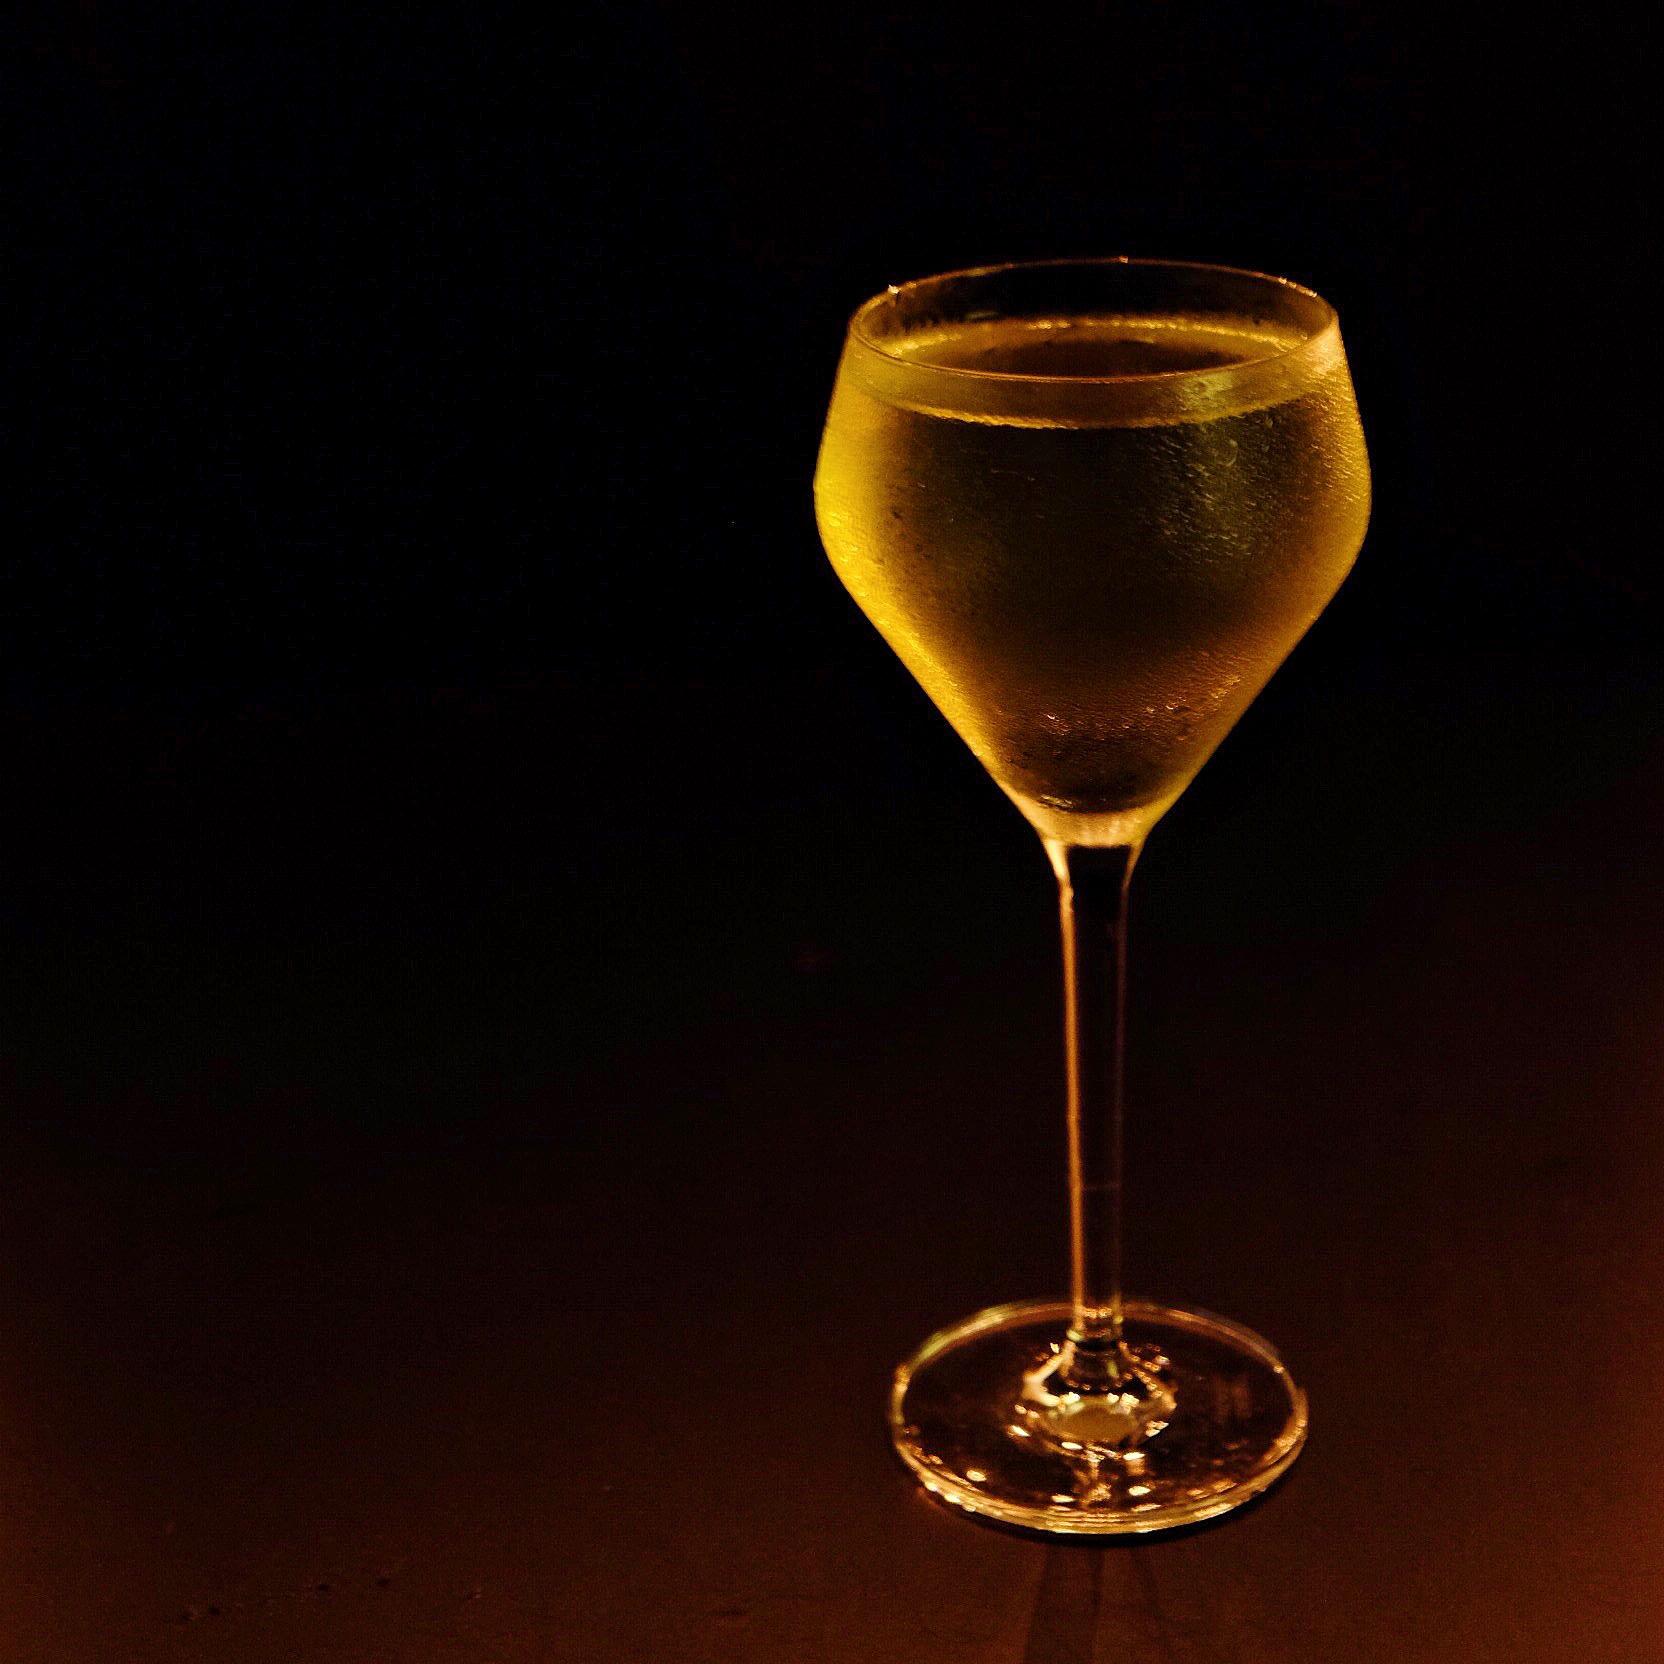 Xanthia Cocktail; Glassware from Sur La Table